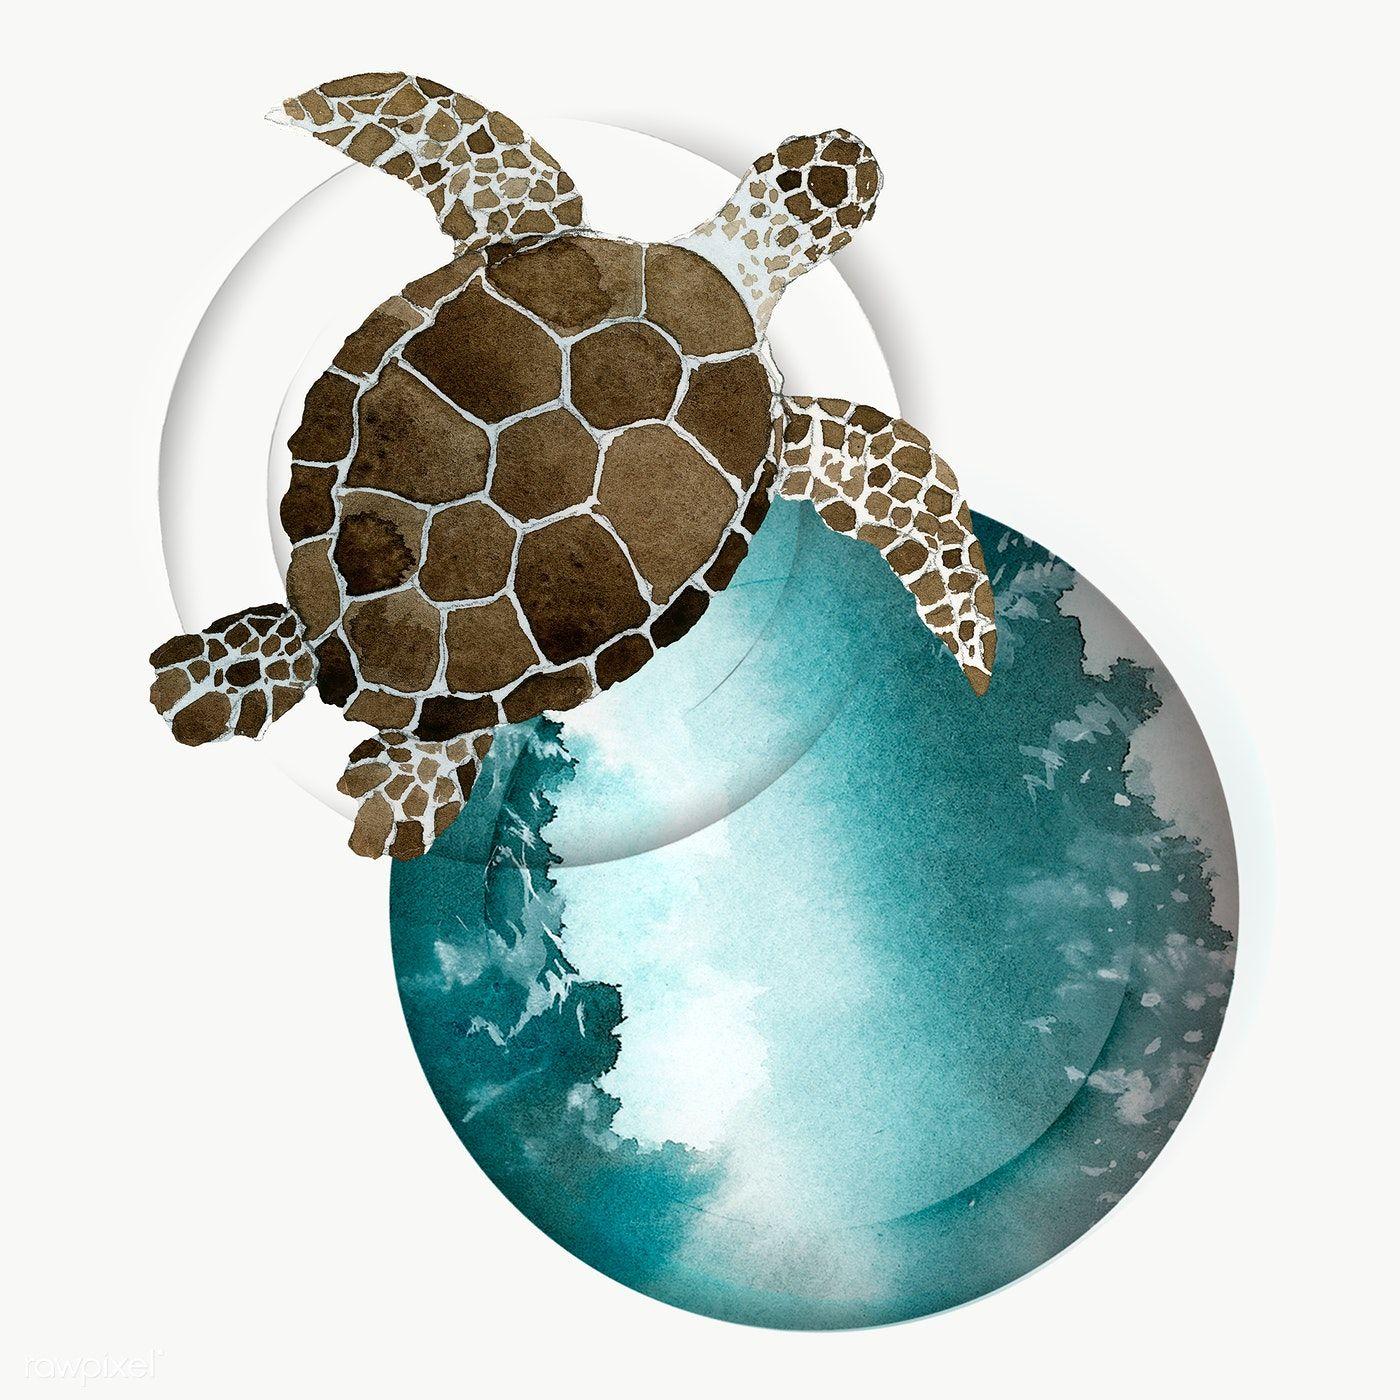 Watercolor Painted Sea Turtle Transparent Png Premium Image By Rawpixel Com Niwat Turtle Watercolor Sea Turtle Watercolor Fish Drawings